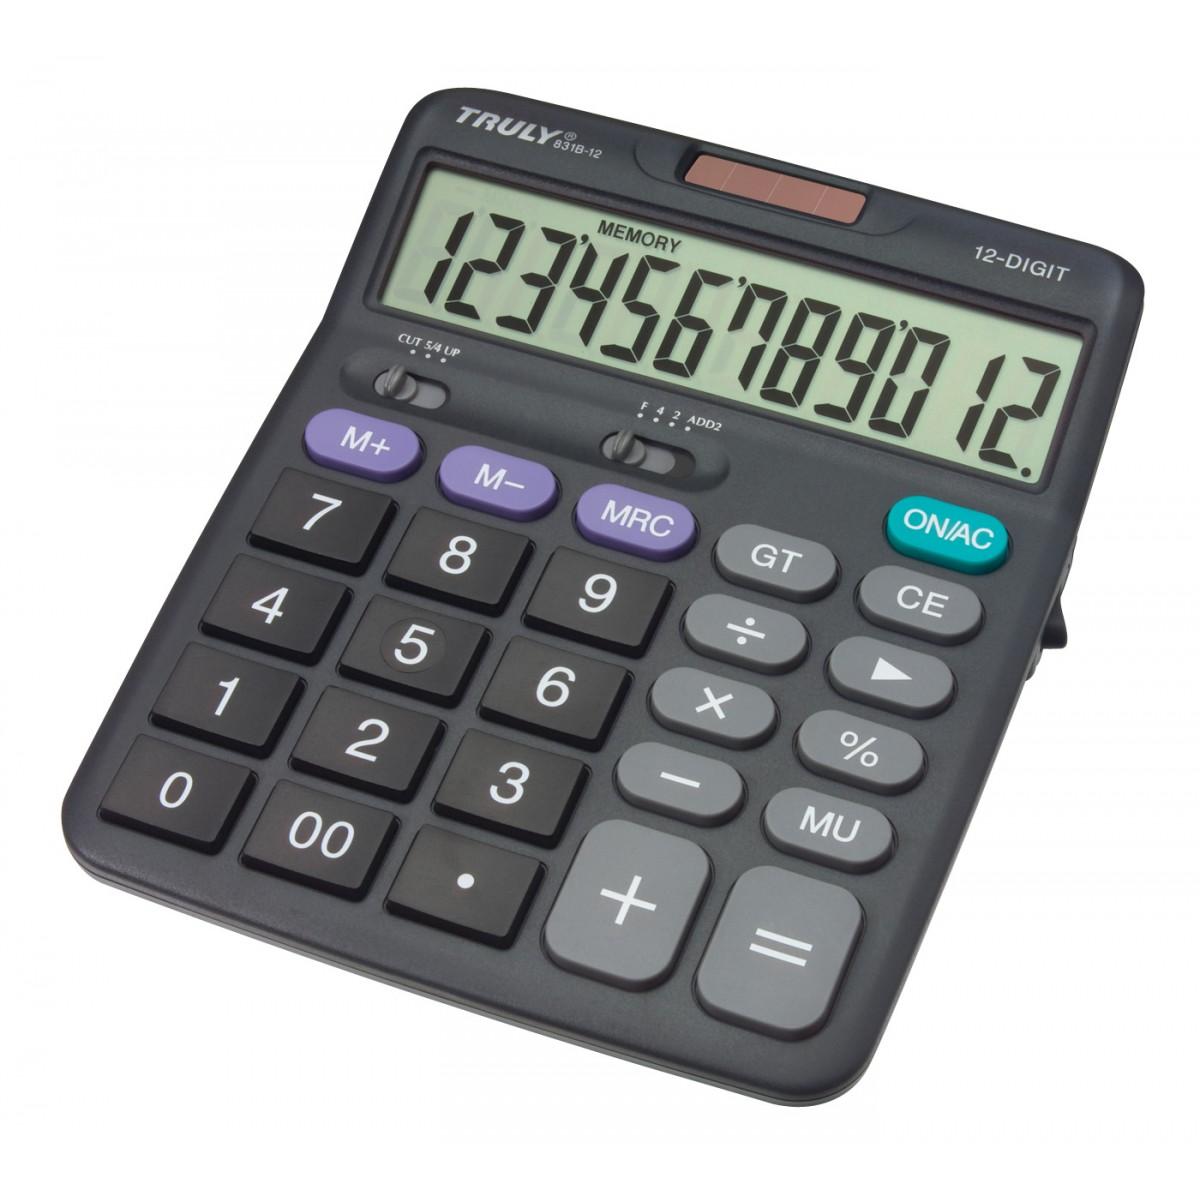 TRULY - Calculadora de Mesa -  12 Dígitos  - 831B-12